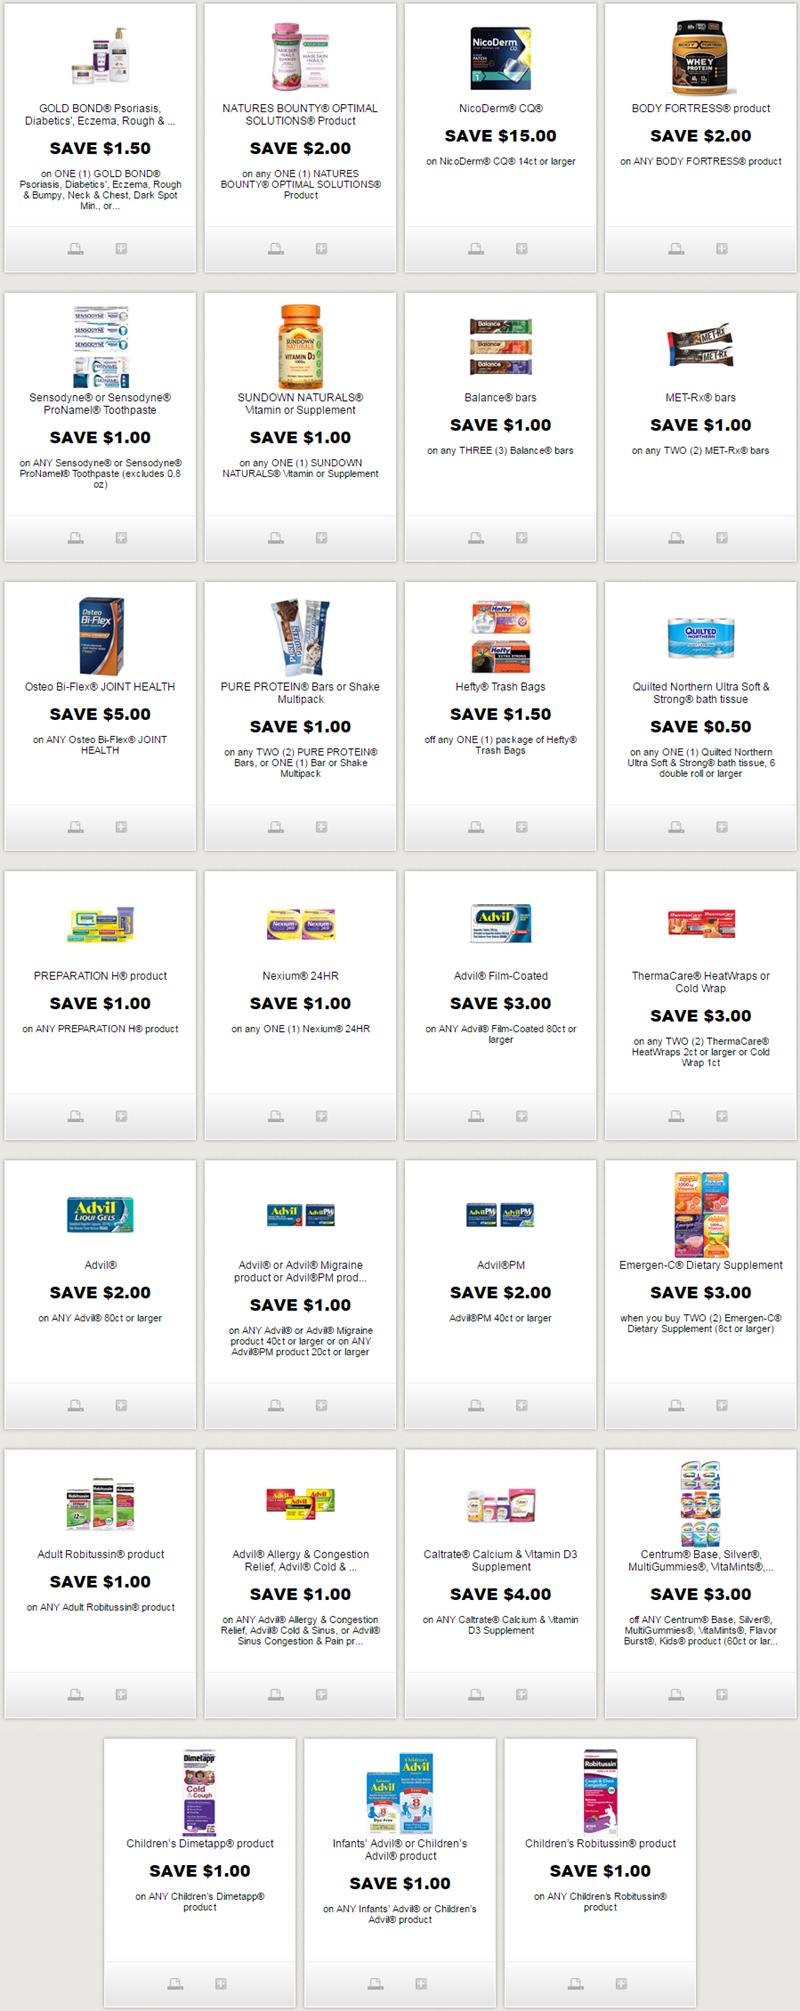 New Printable Coupons For Hefty Advil Centrum More Http Www Iheartcoupons Net P Redplum Html Coupons Couponing Printable Coupons Centrum Coupons